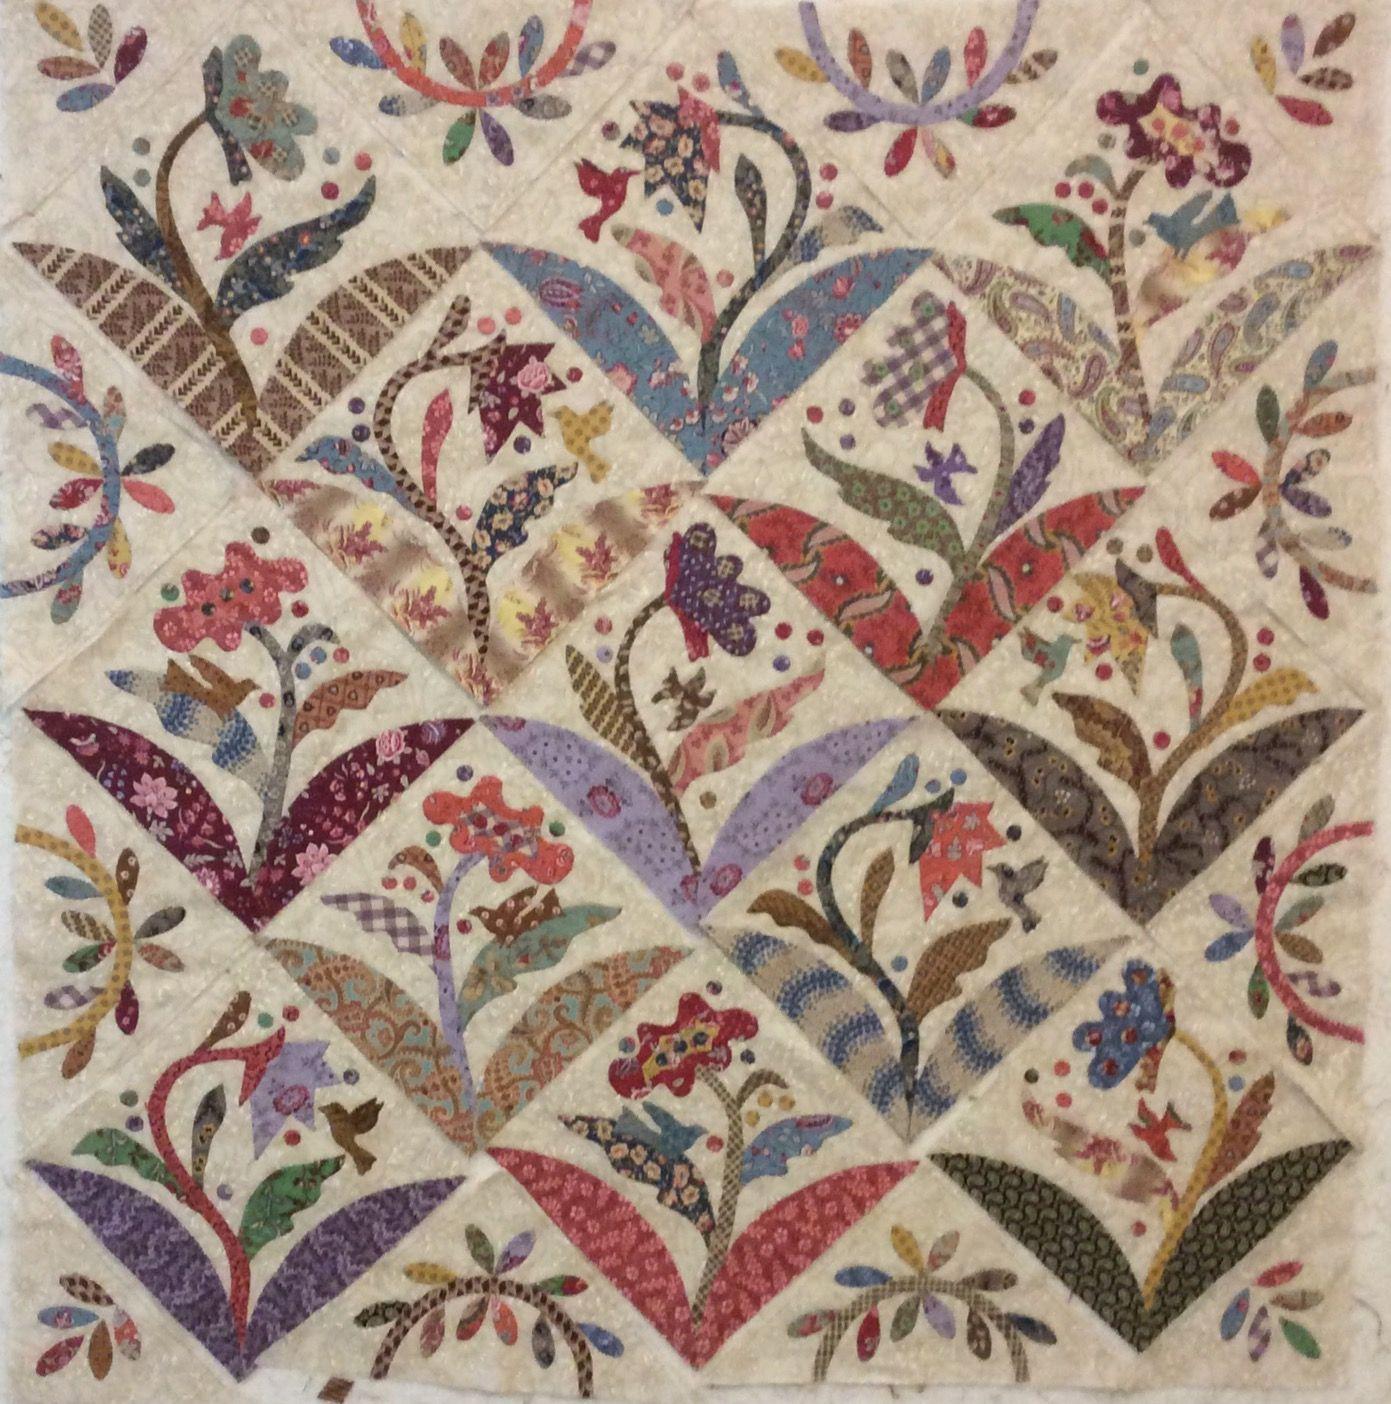 Posies by blackbird designs reduced from 20 to 10 for Blackbird designs christmas garden